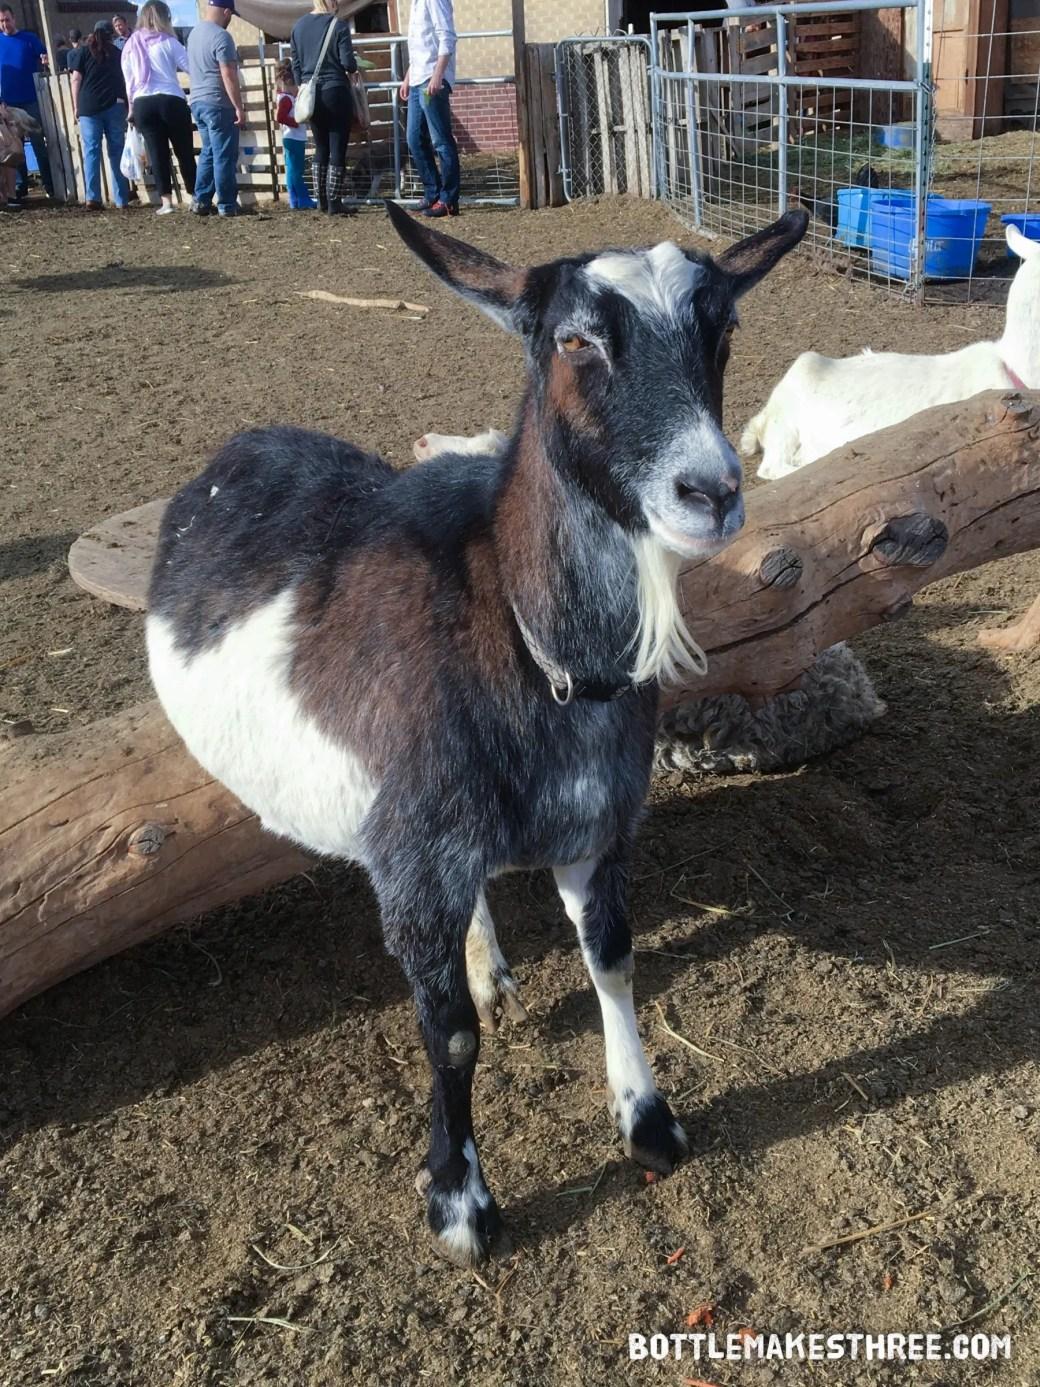 Tripod, the 3-legged goat. At the Happy Thanks-Living at Broken Shovels Farm (Henderson, Colorado) | BottleMakesThree.com